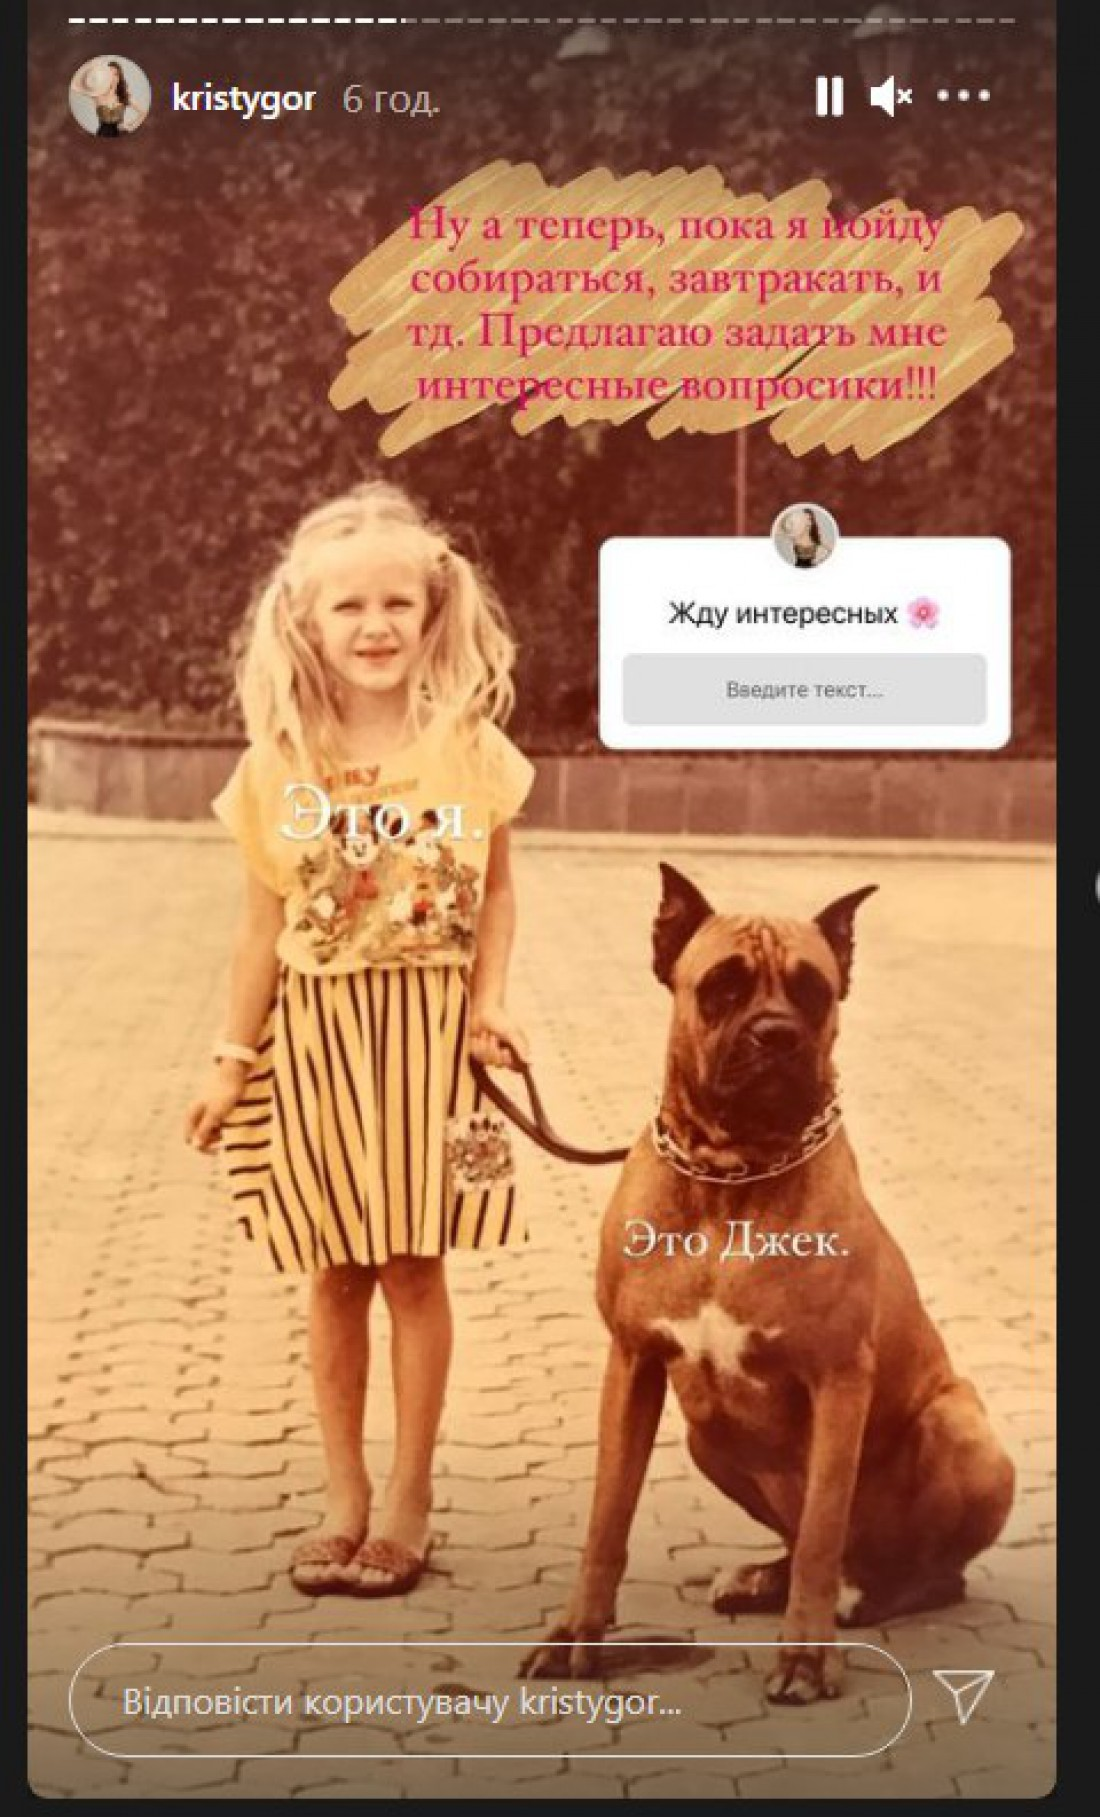 Кристину Остапчук не узнали на детском фото